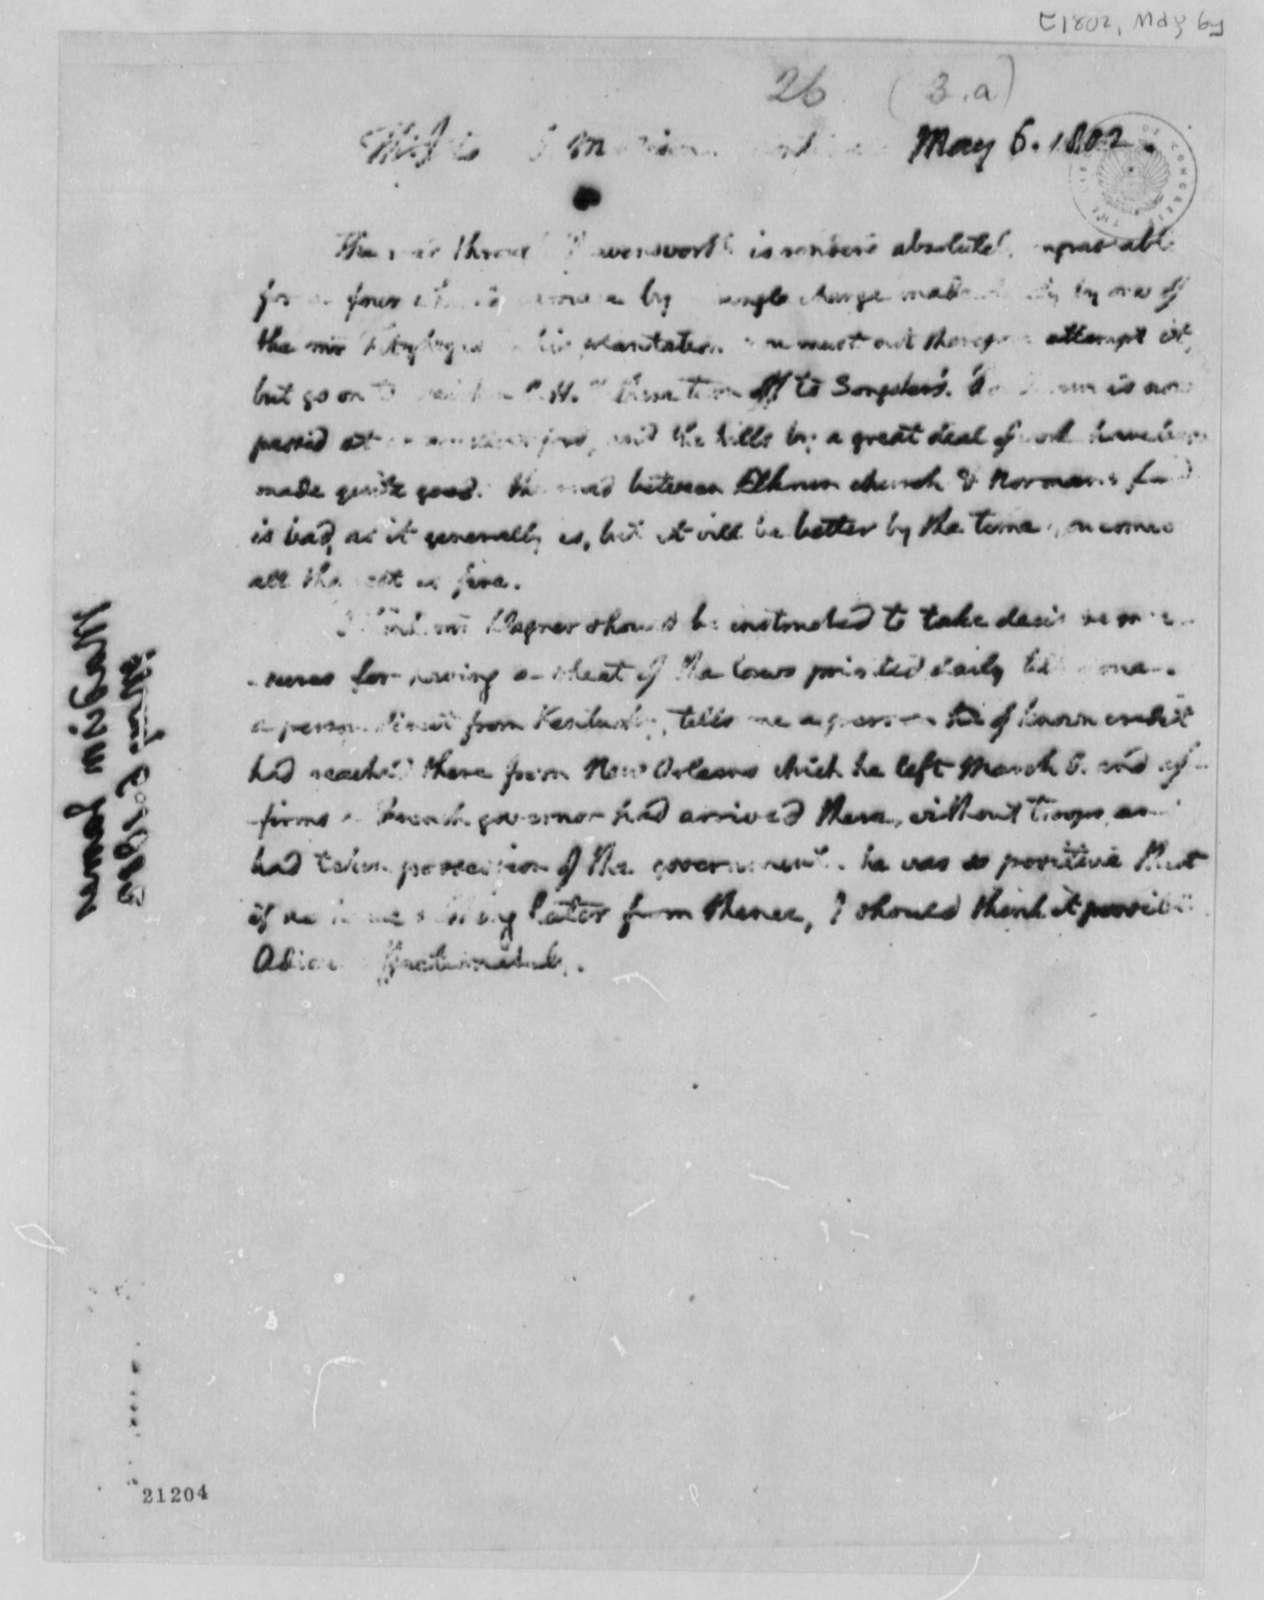 Thomas Jefferson to James Madison, May 6, 1802